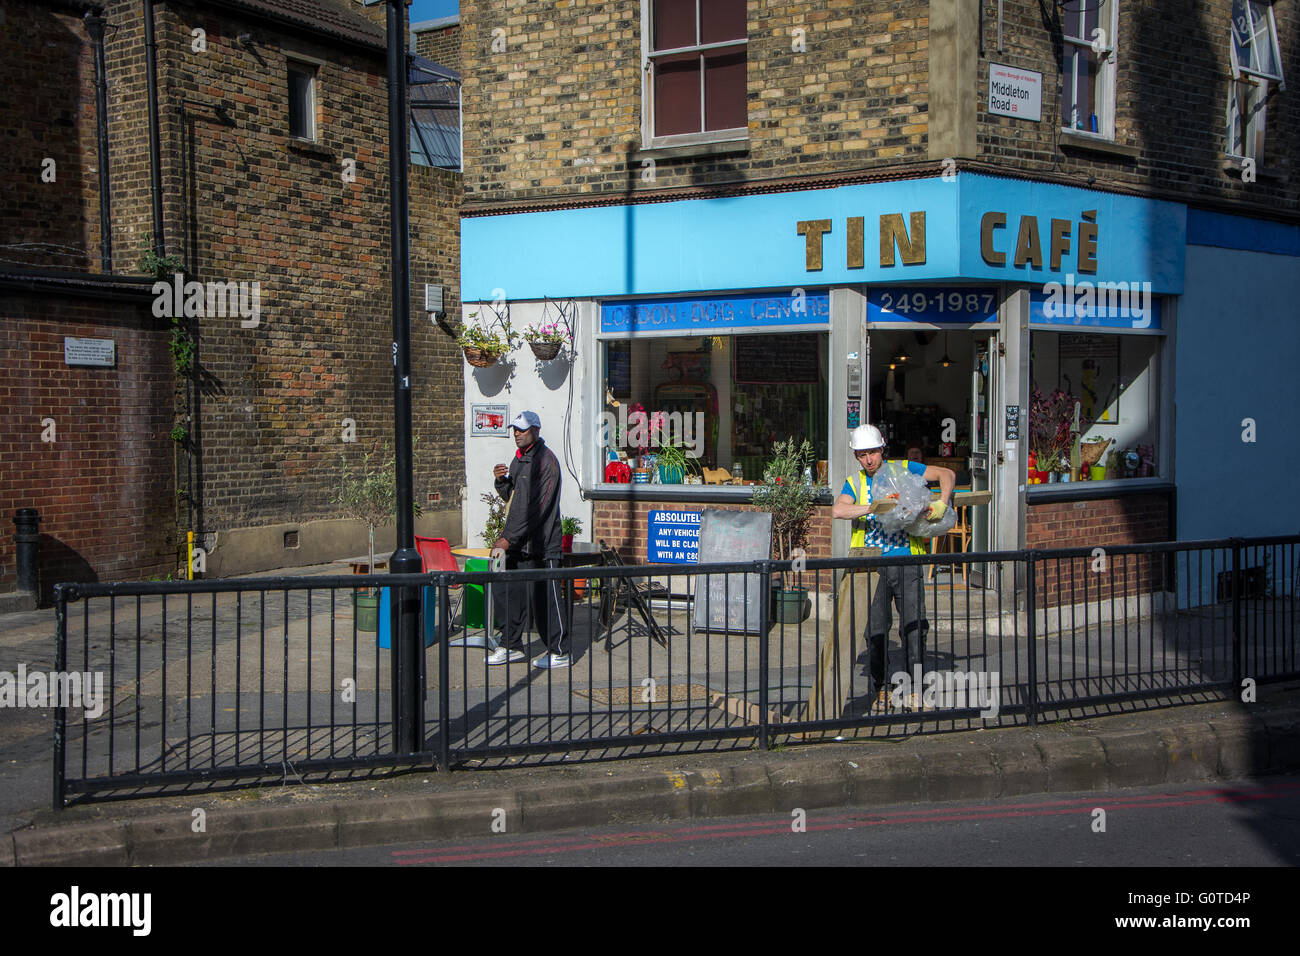 Tin Café, Haggerston, East London - Stock Image